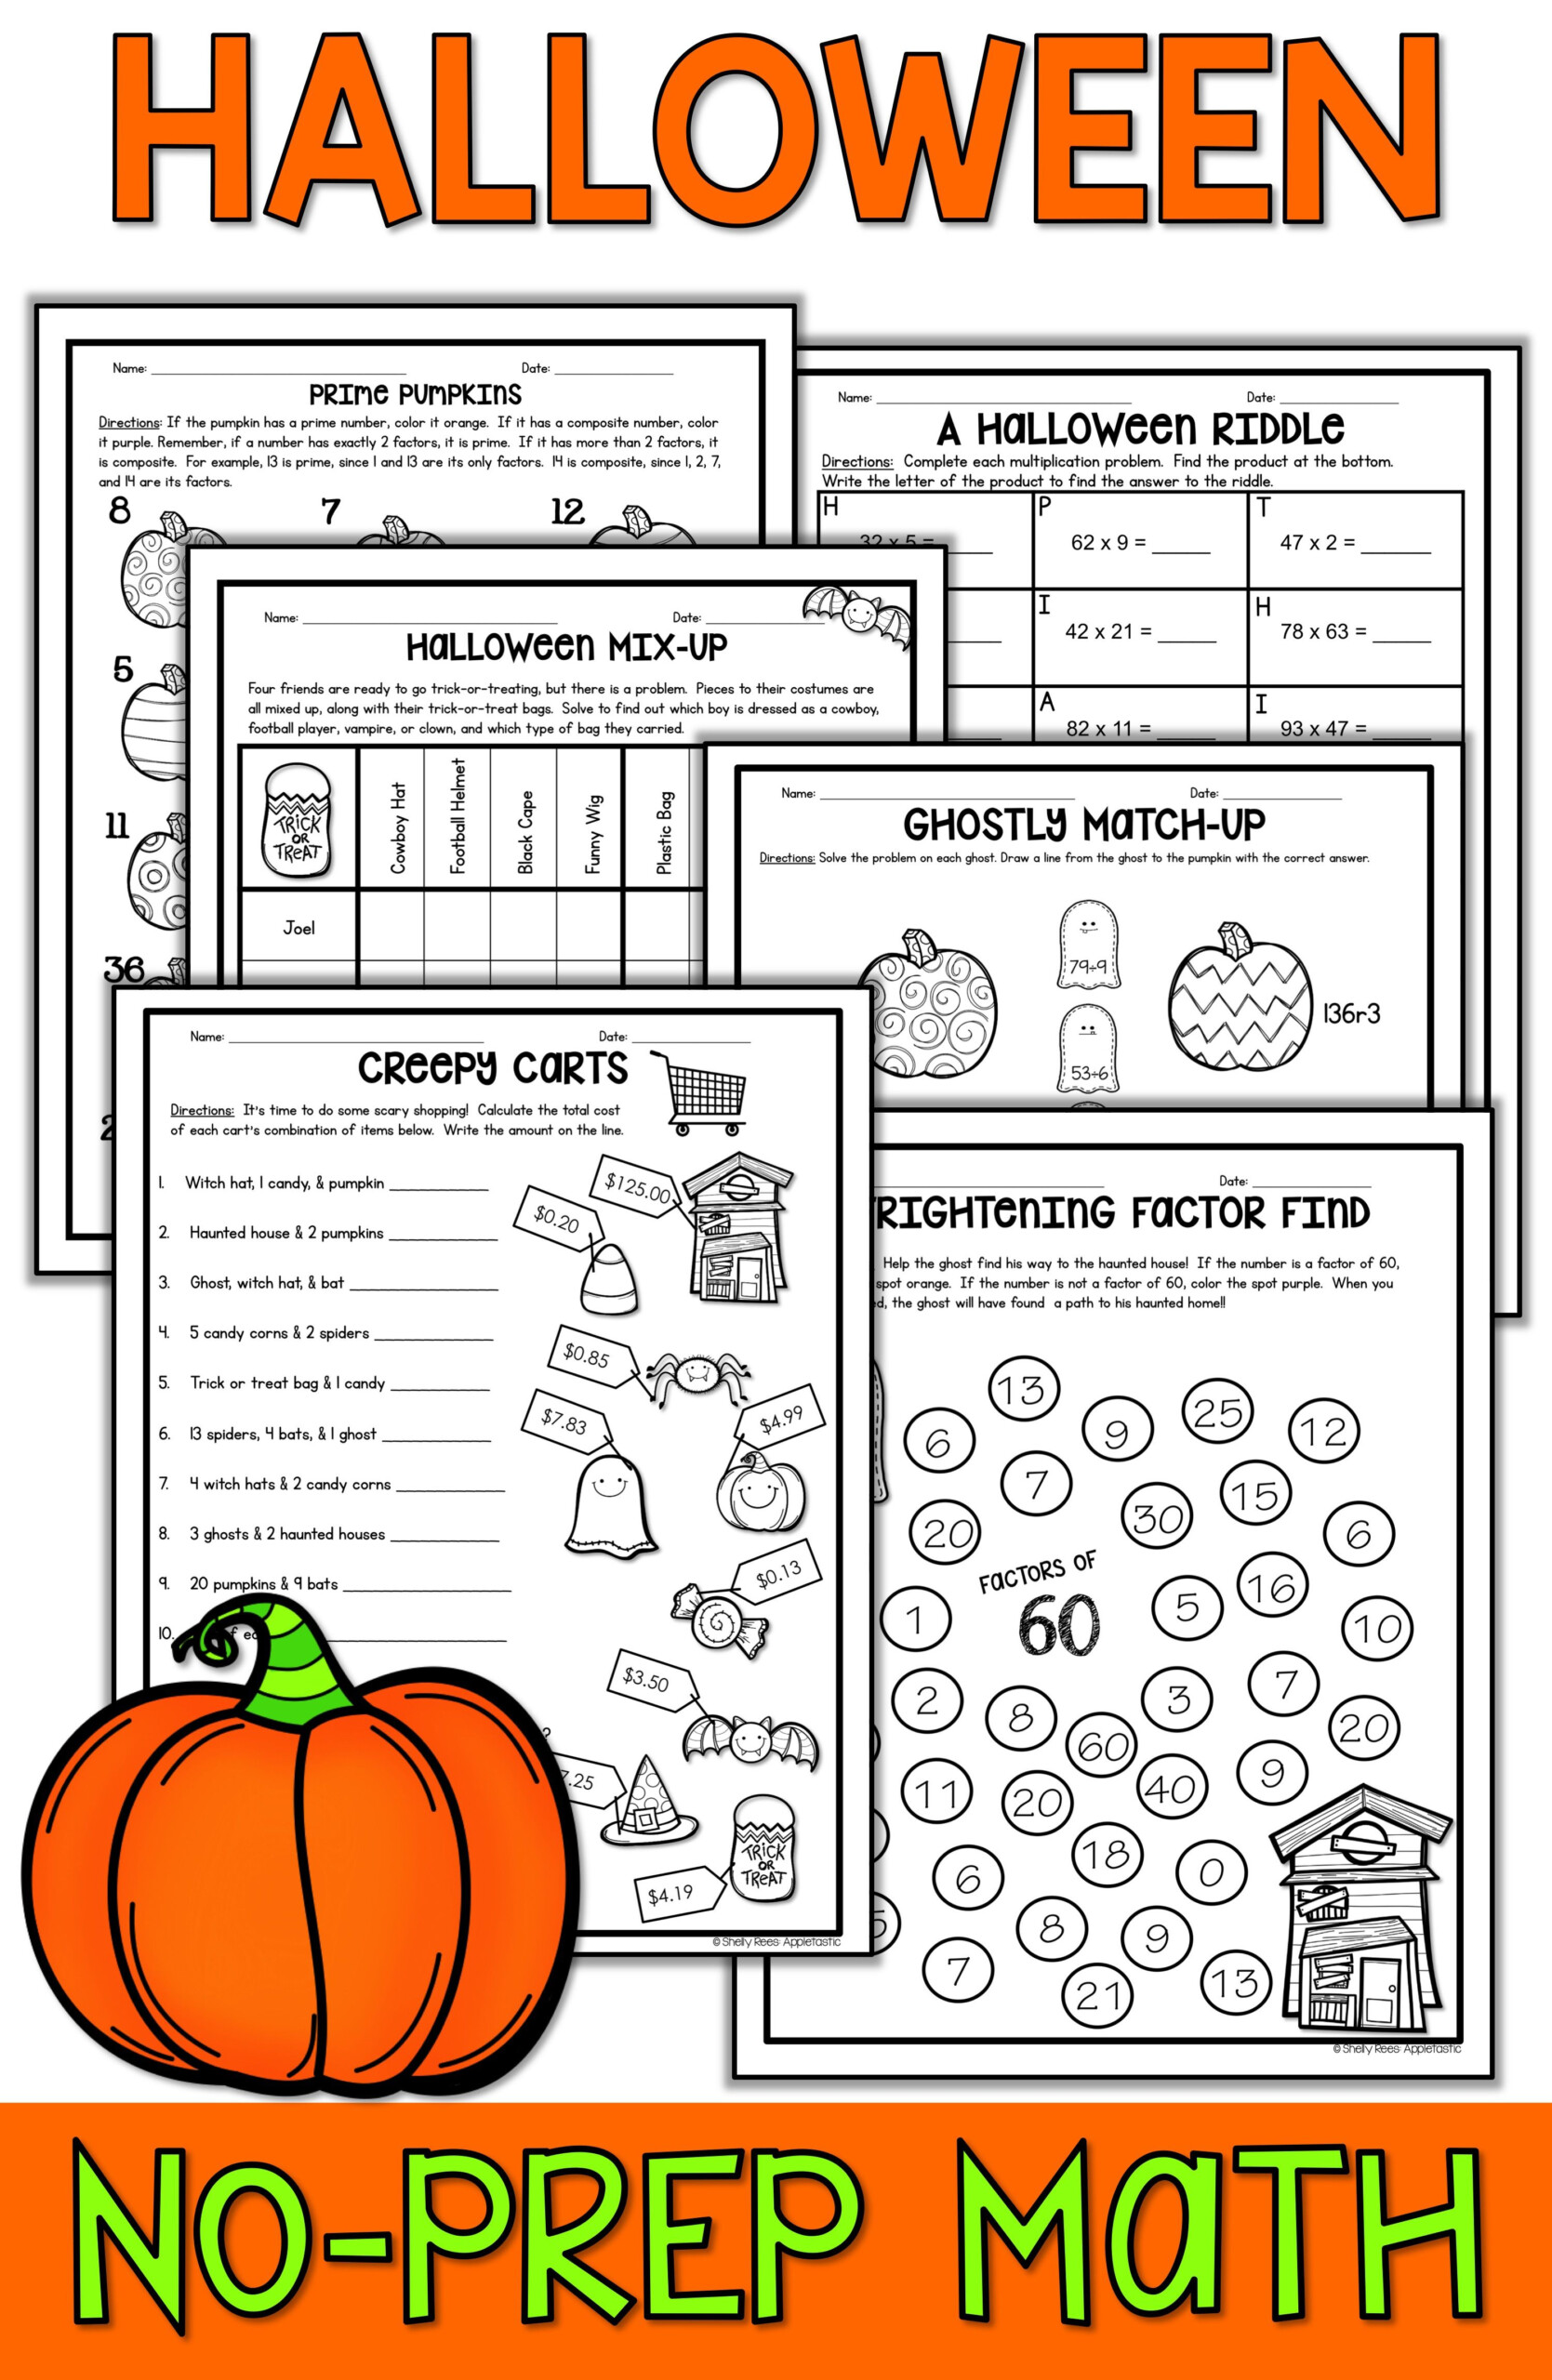 Halloween Math Worksheets | Halloween Math Worksheets regarding Multiplication Worksheets Halloween